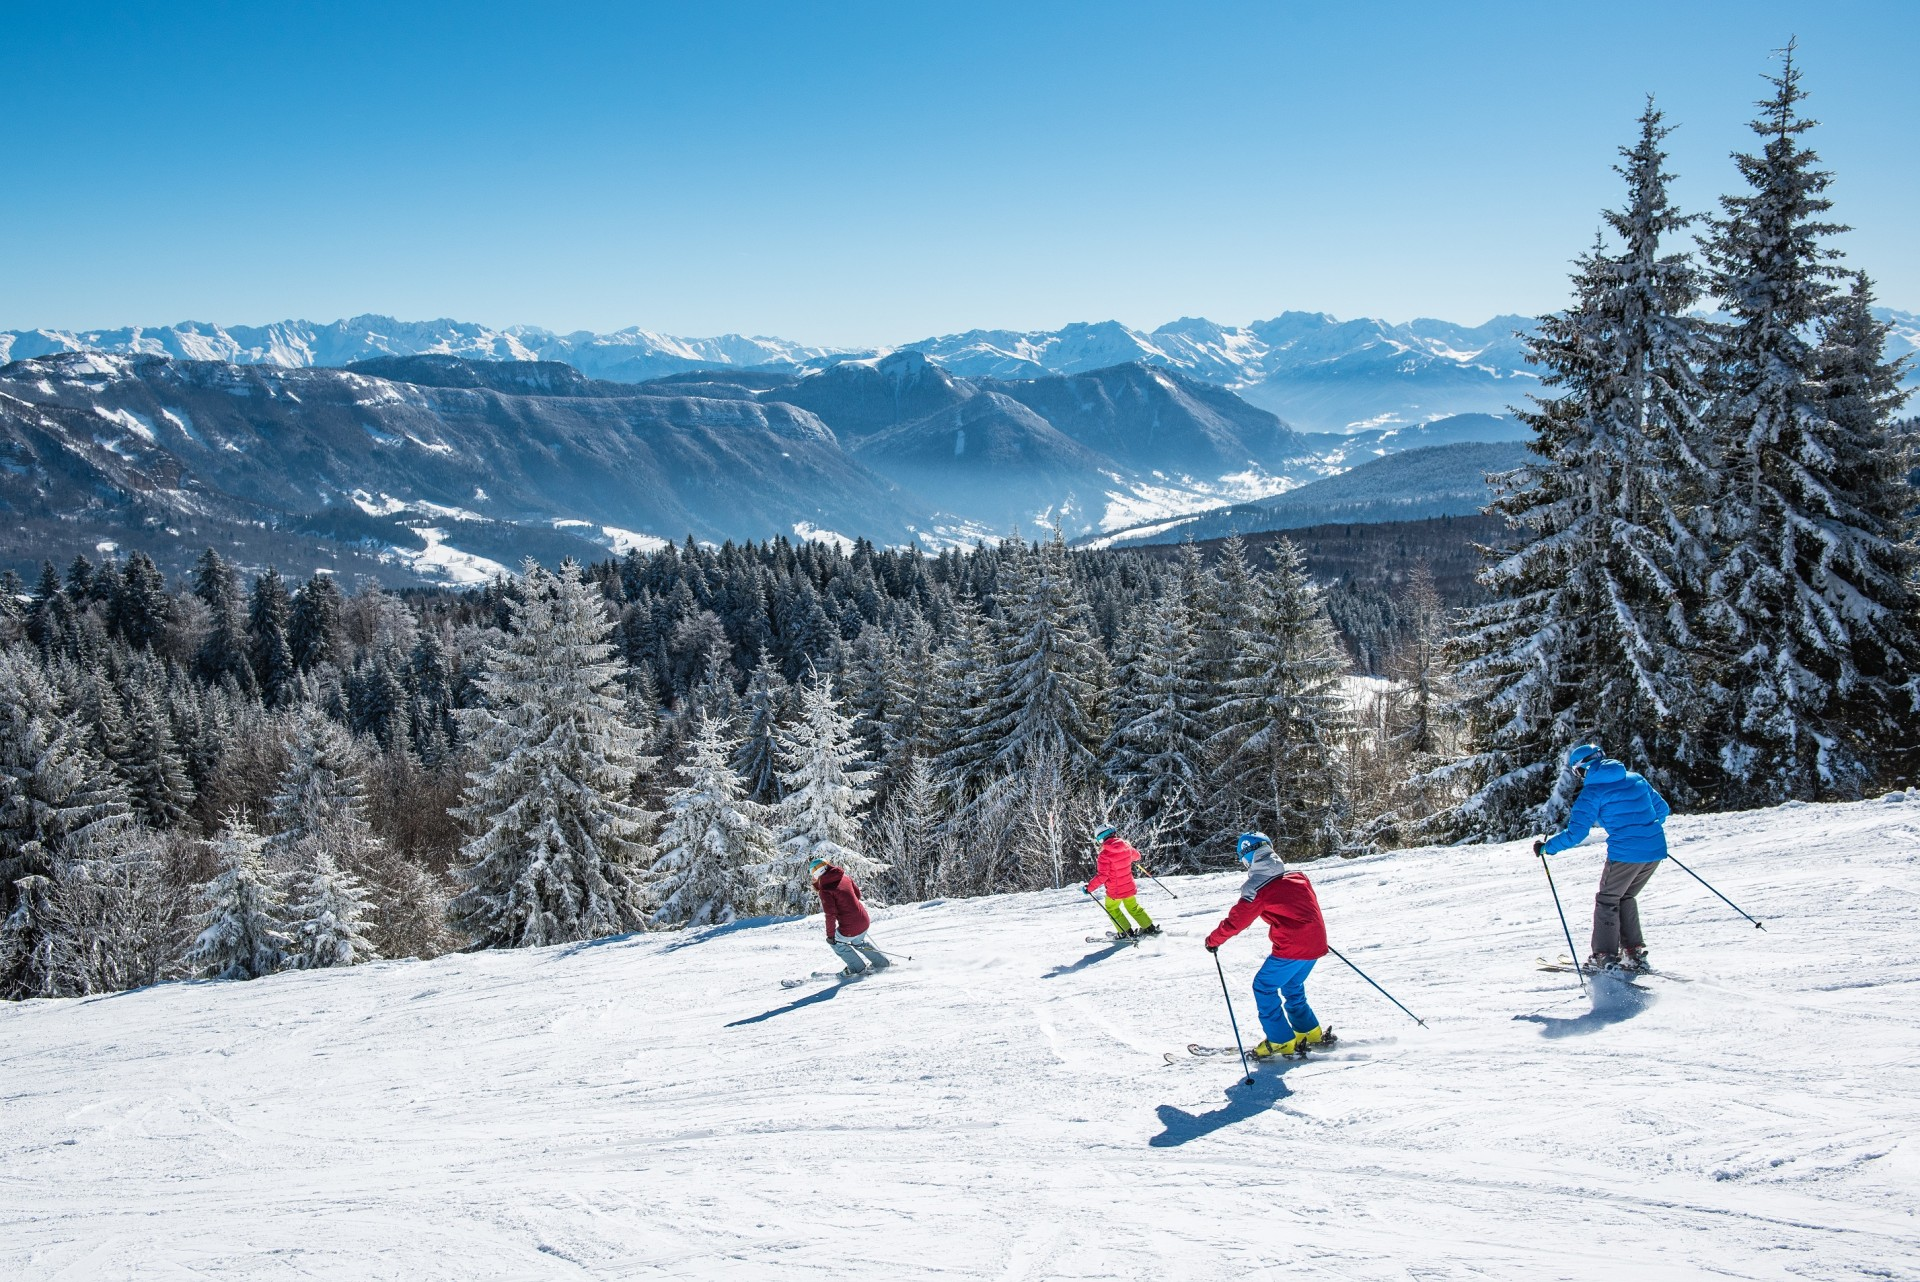 ski-alpin-famille-la-feclaz-hd-savoie-grand-revard-peignee-verticale-t-nalet-10-435